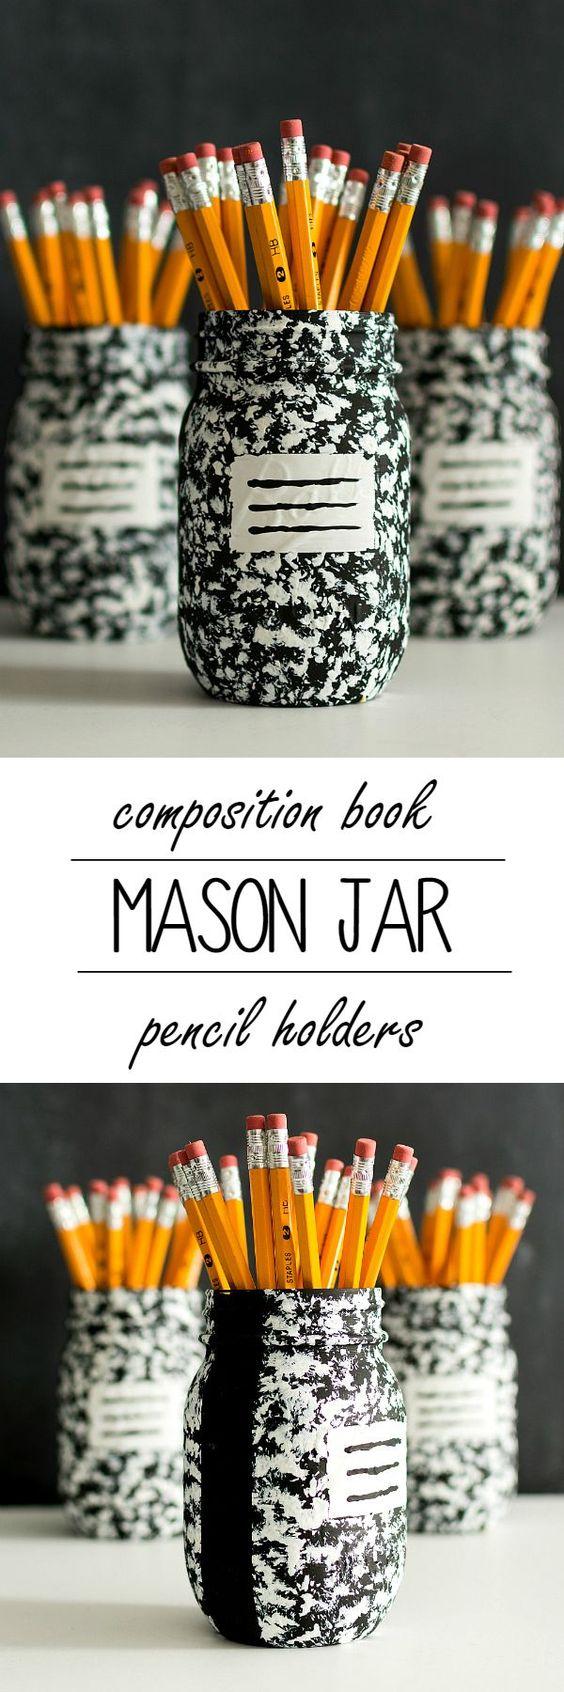 Desk organizer idea composition book mason jar jars for Mason jar holder ideas